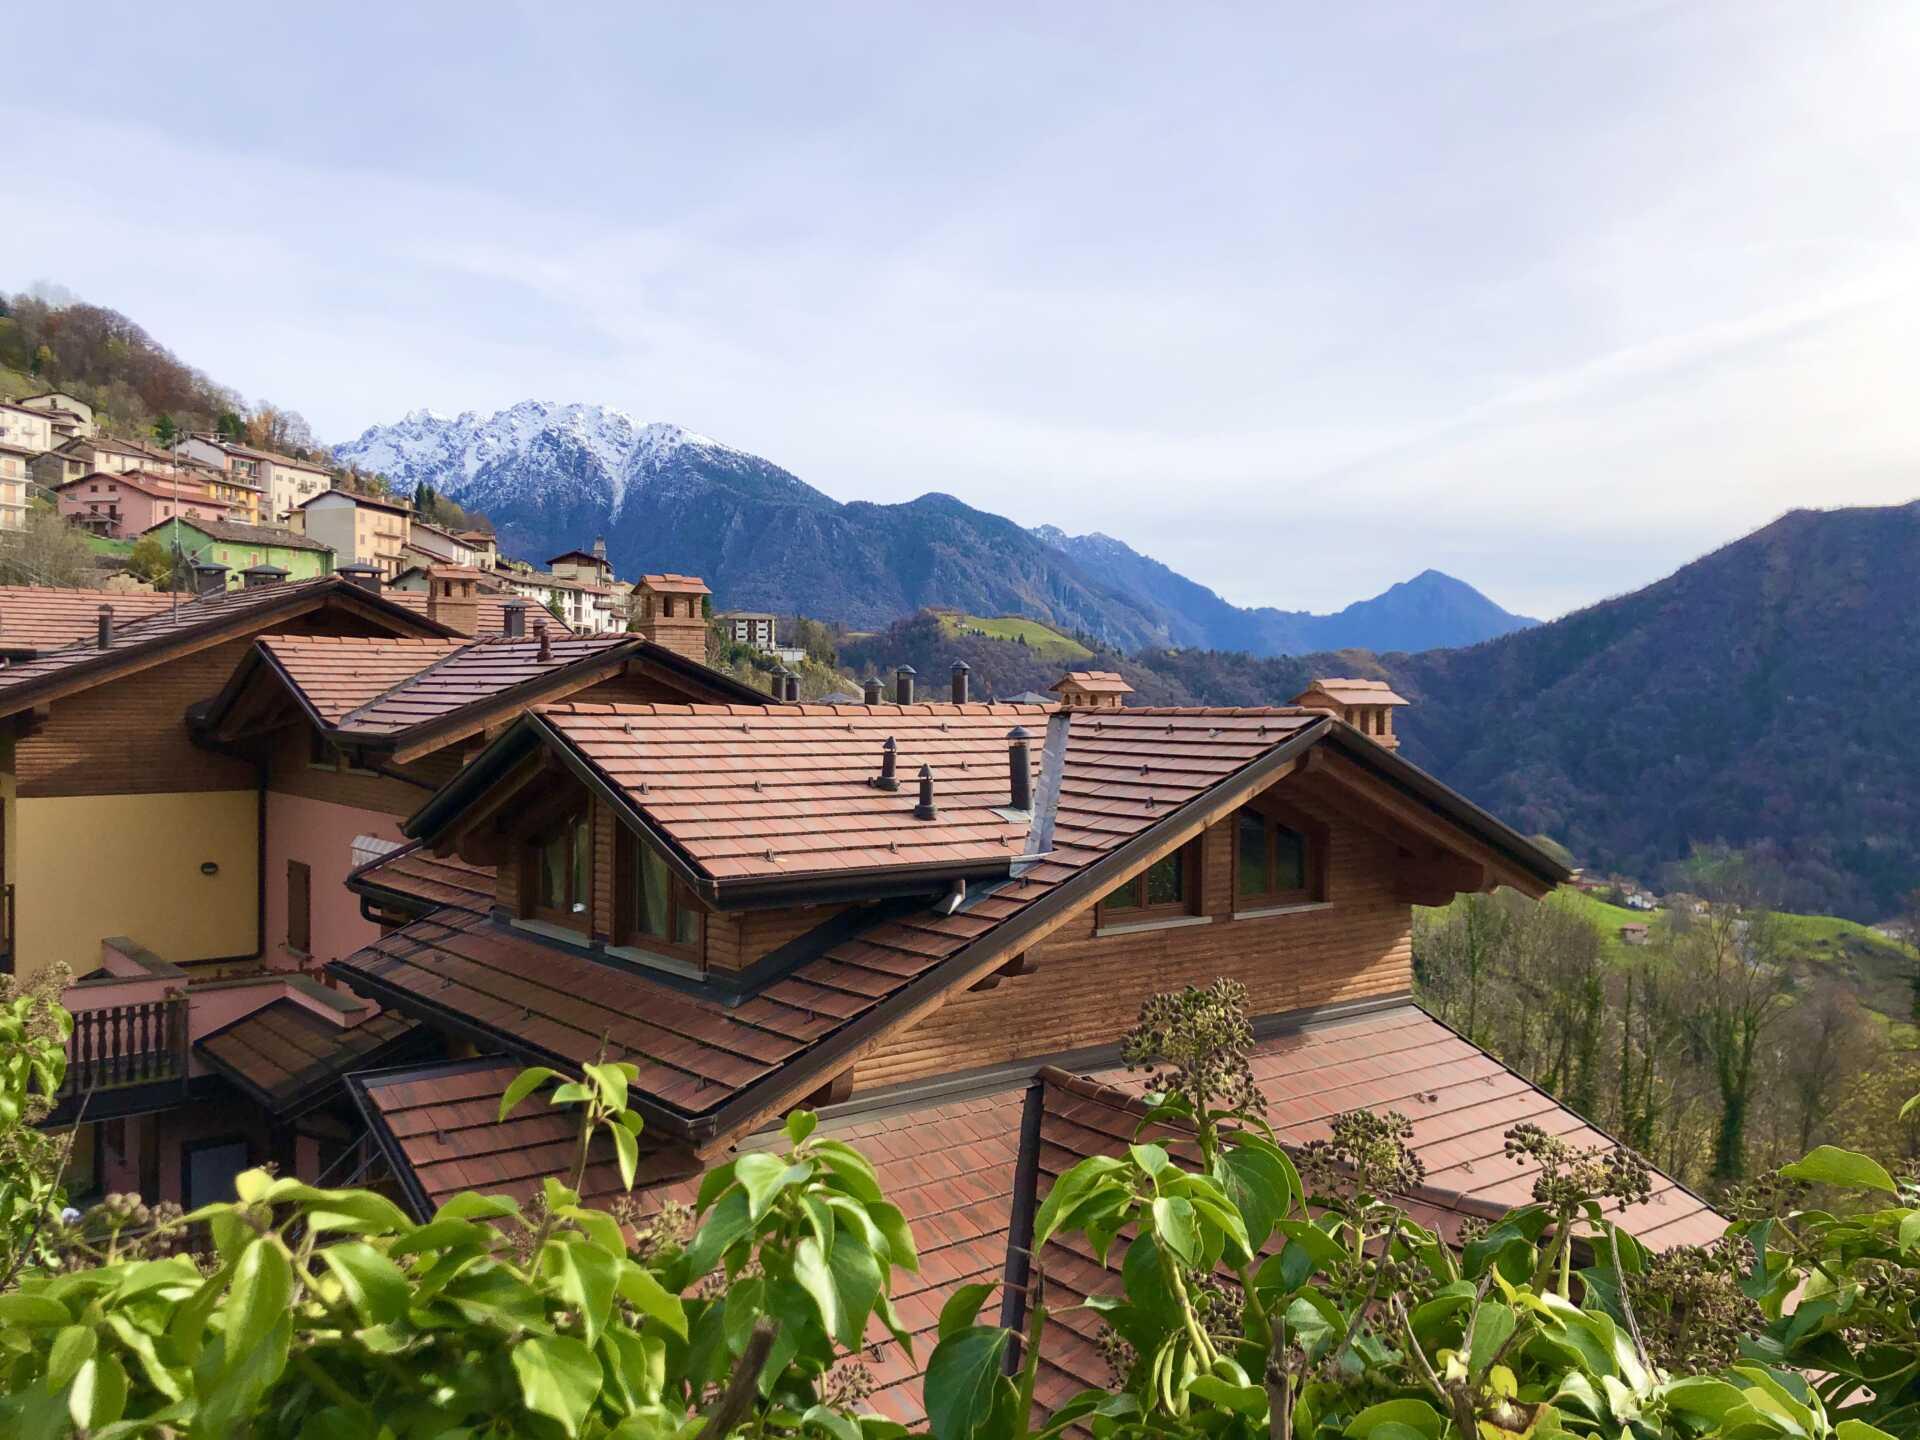 Casa-vacanze-in-vendita-appartamento-a-Dossena